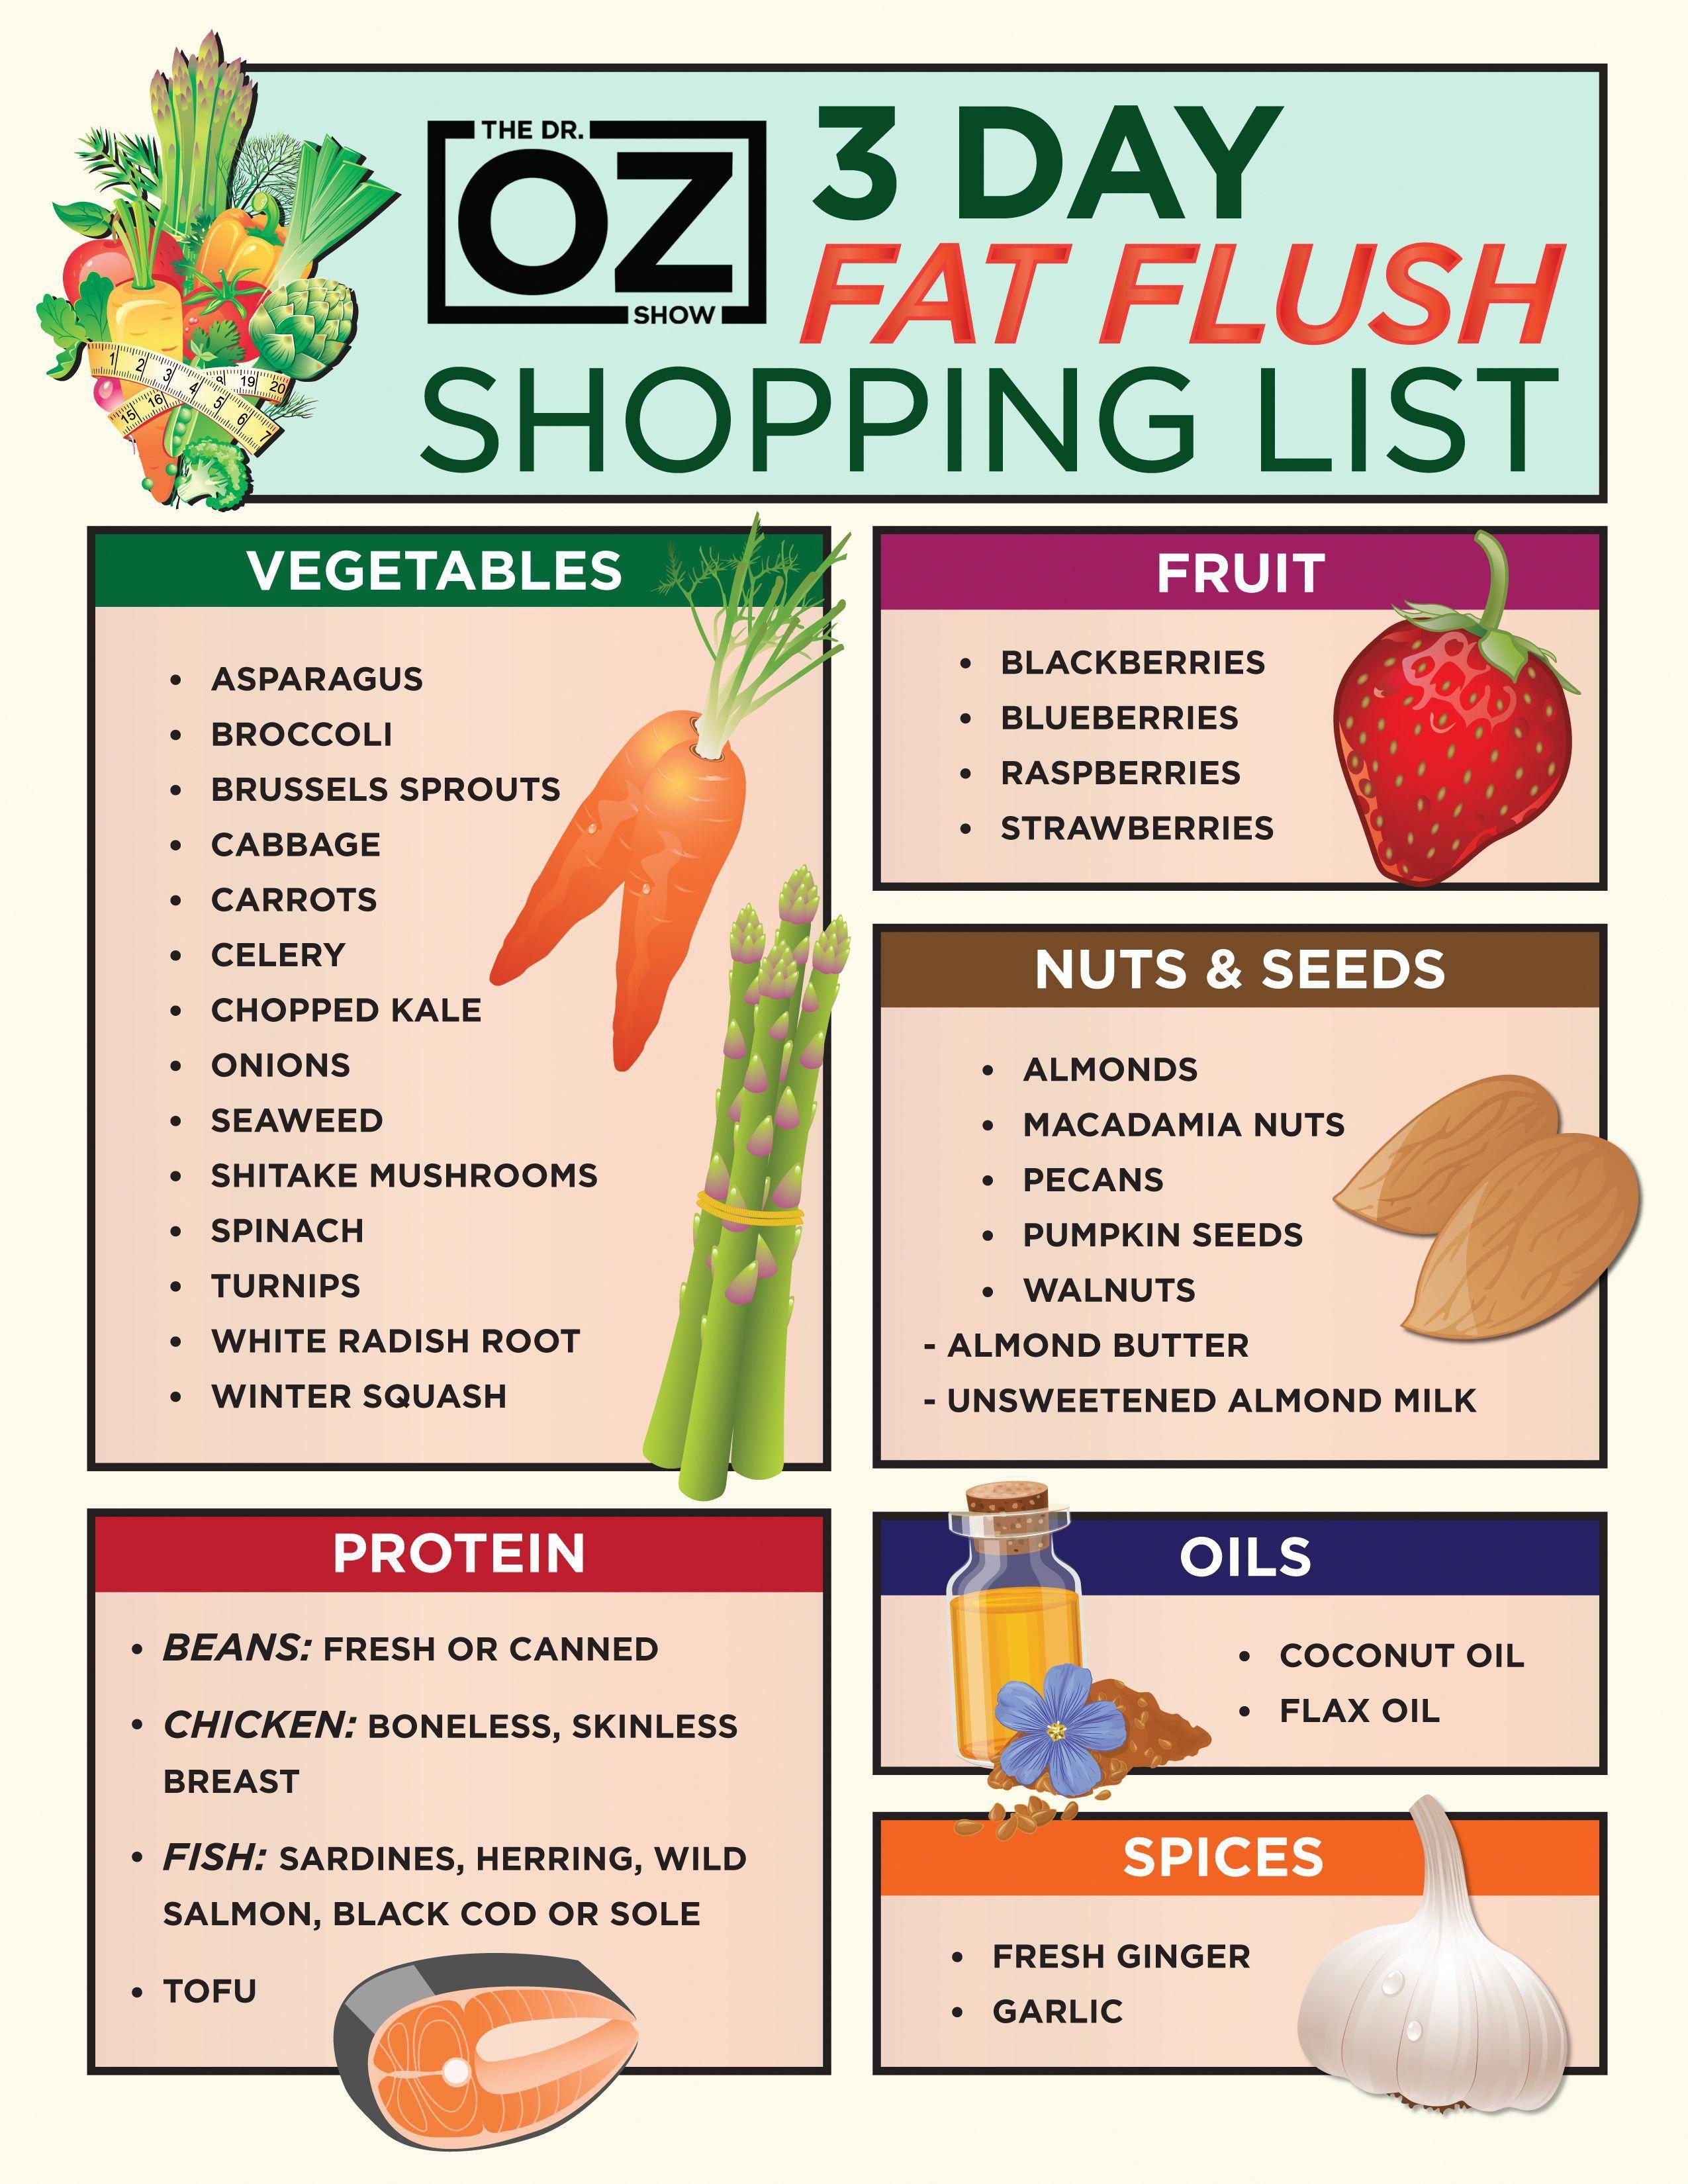 Детокс Диета Список Продуктов. Лучшая детокс диета – меню на три дня